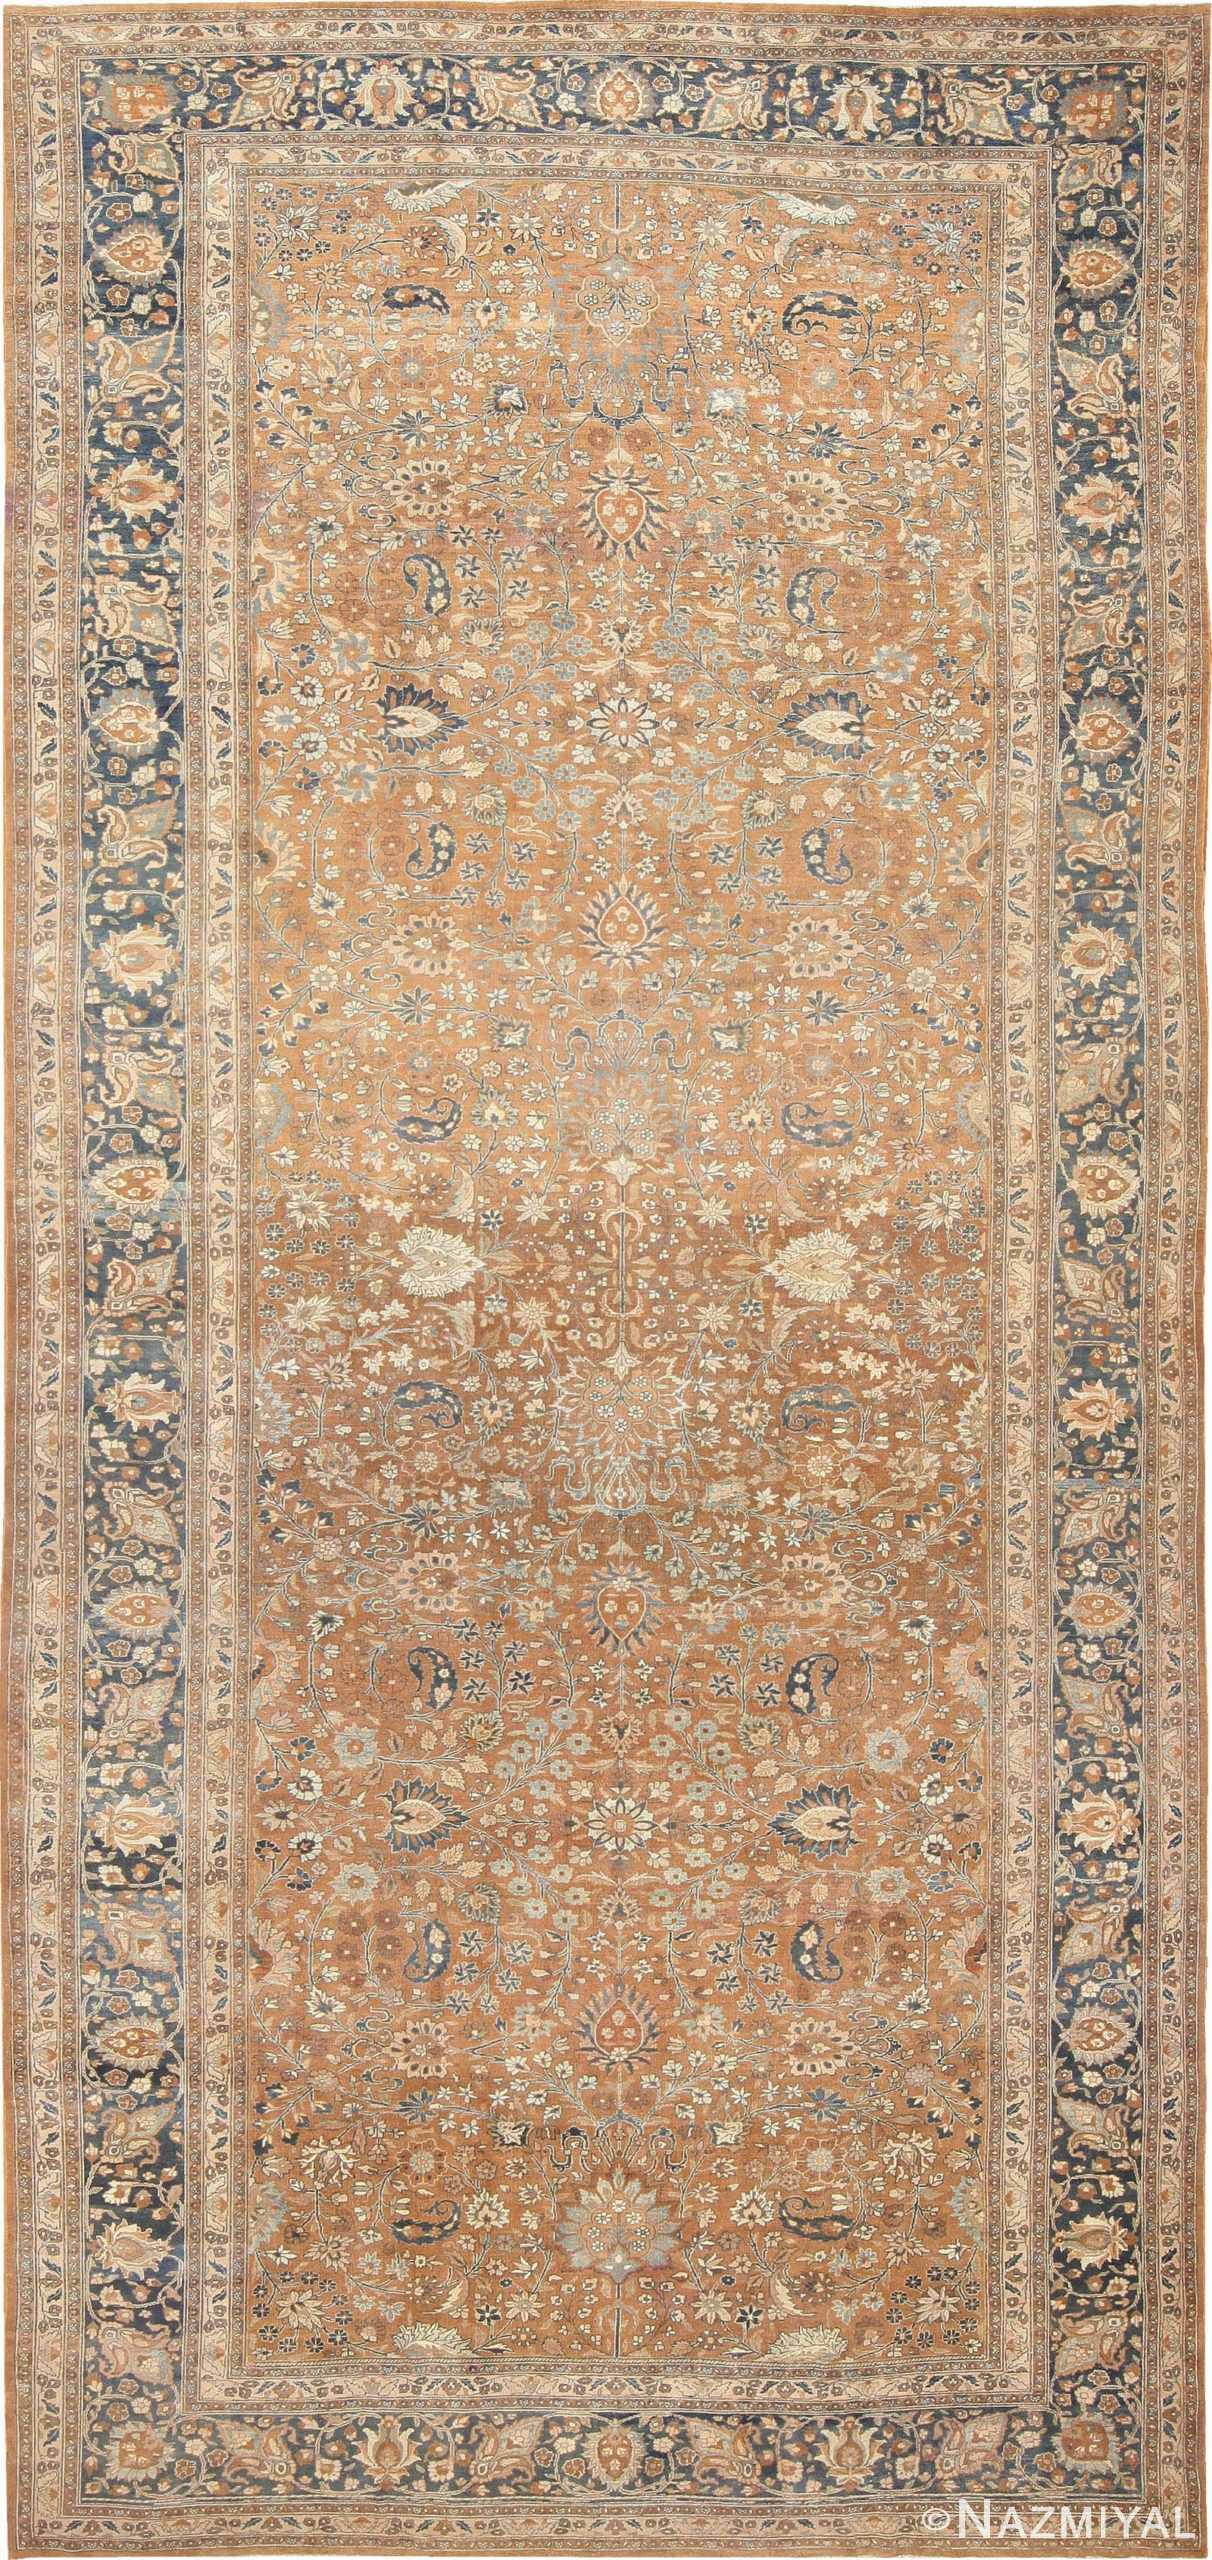 Large Oversize Antique Persian Khorassan Carpet 47032 Nazmiyal